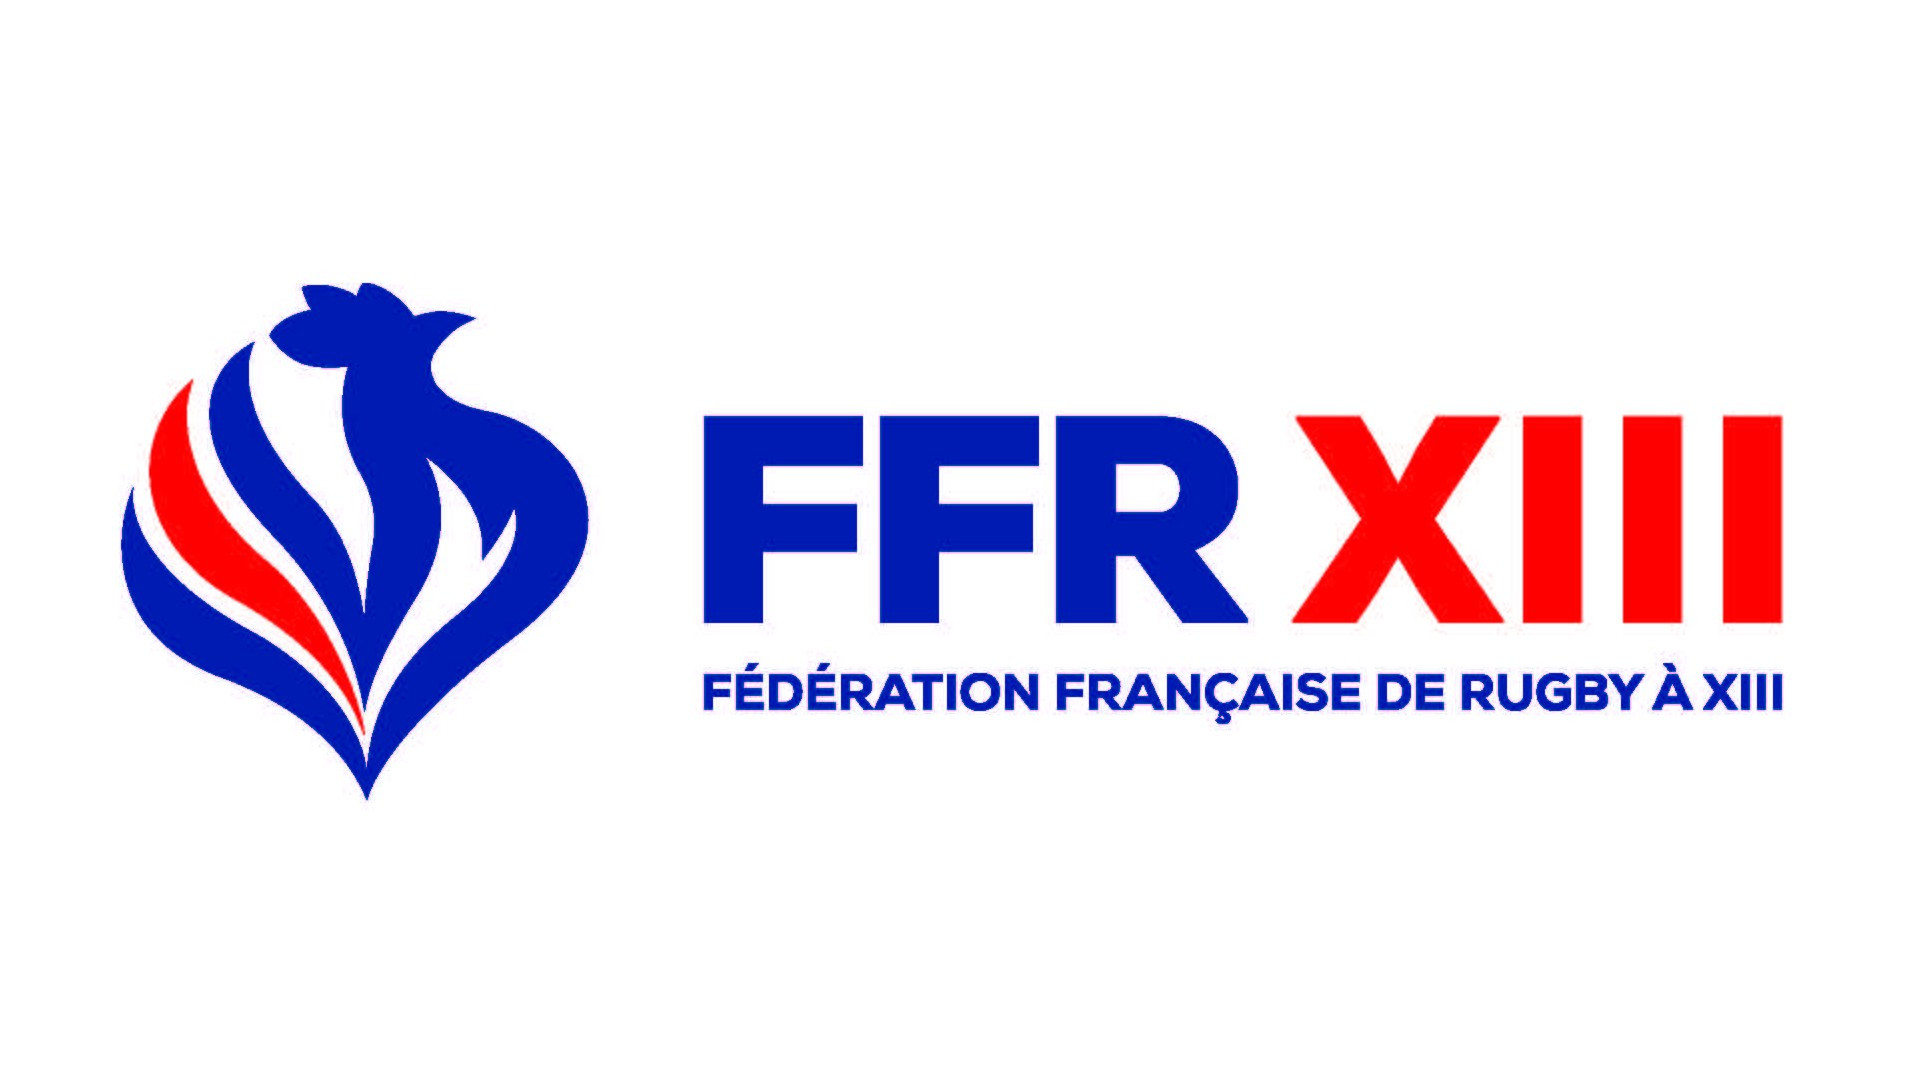 Fédération française de Rugby à XIII FFRXIII (1) logo